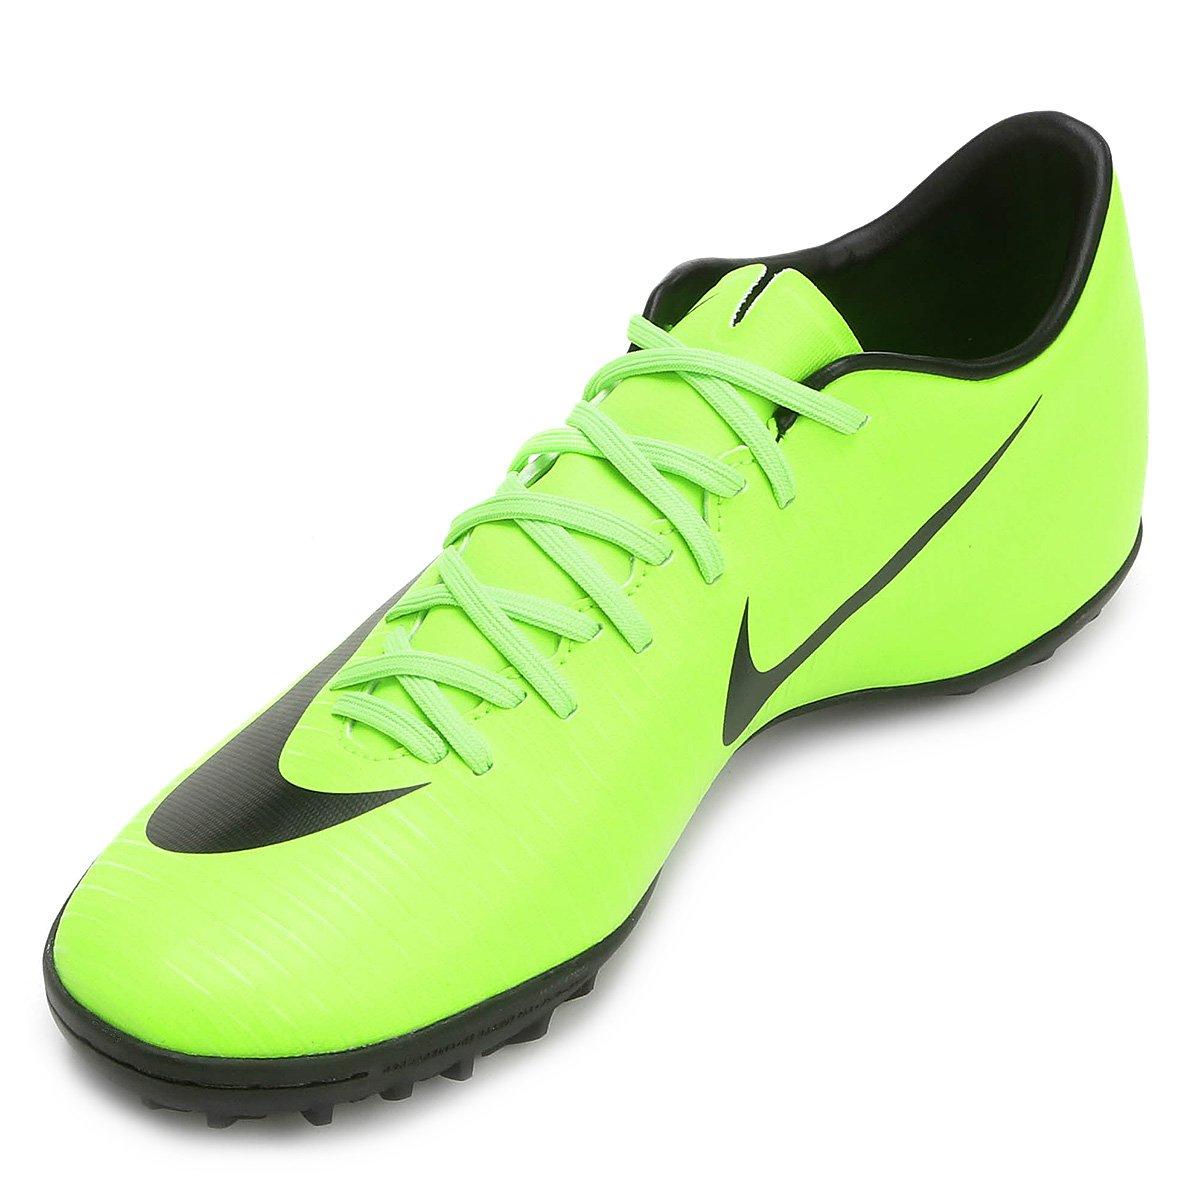 0a8da2027f Chuteira Society Nike Mercurial Victory 6 TF - Verde e Preto ...